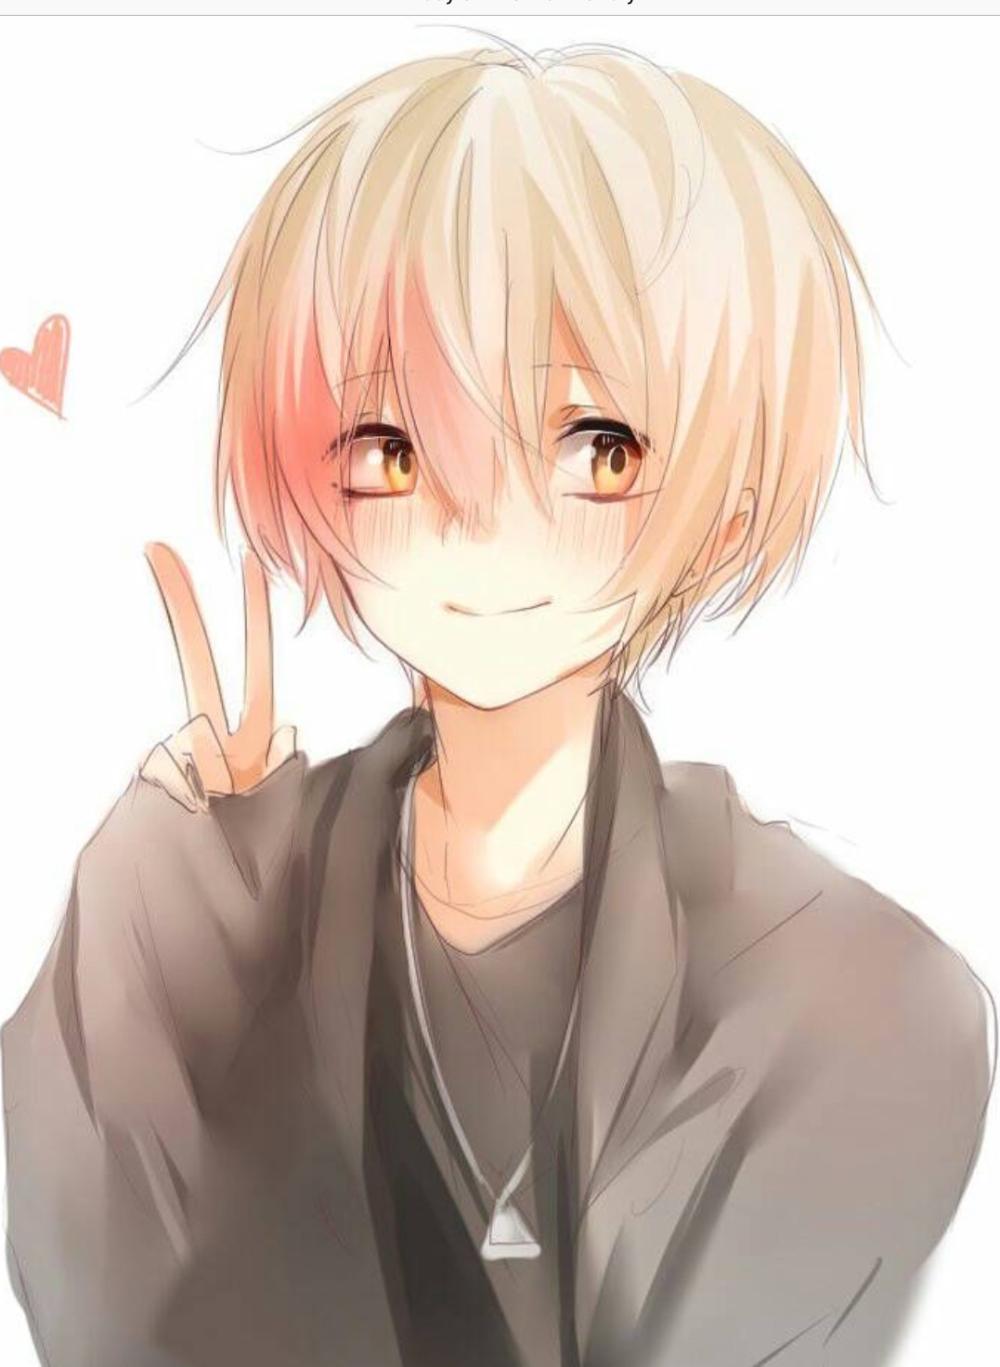 1077 1473 In 2020 Anime Boy Hair Blushing Anime Cute Anime Guys